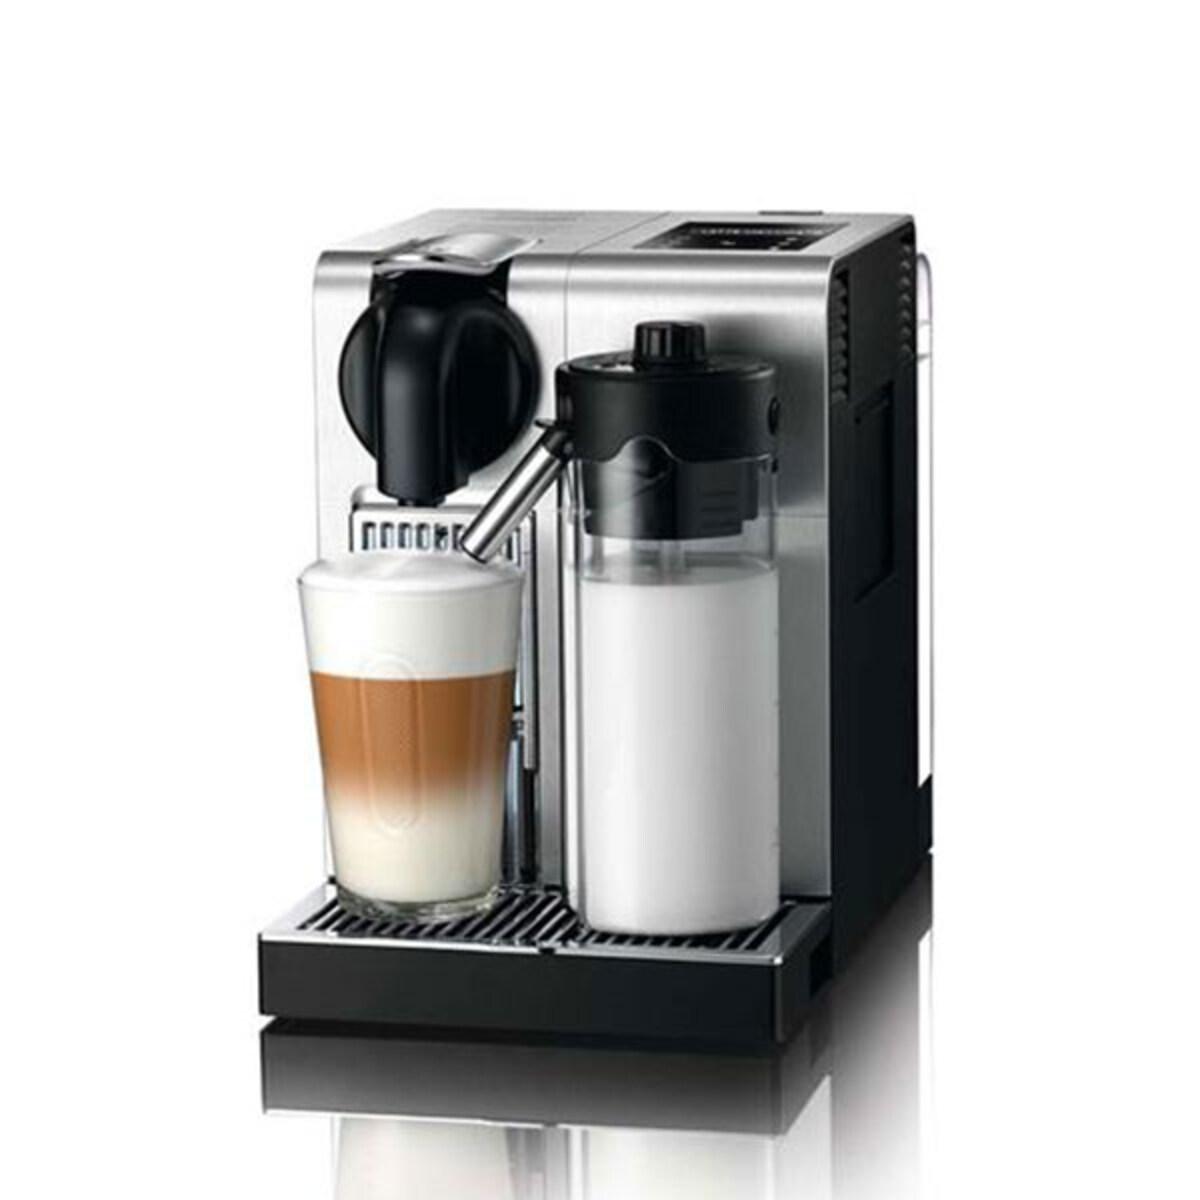 Nespresso Lattissima Pro EN 750 MB